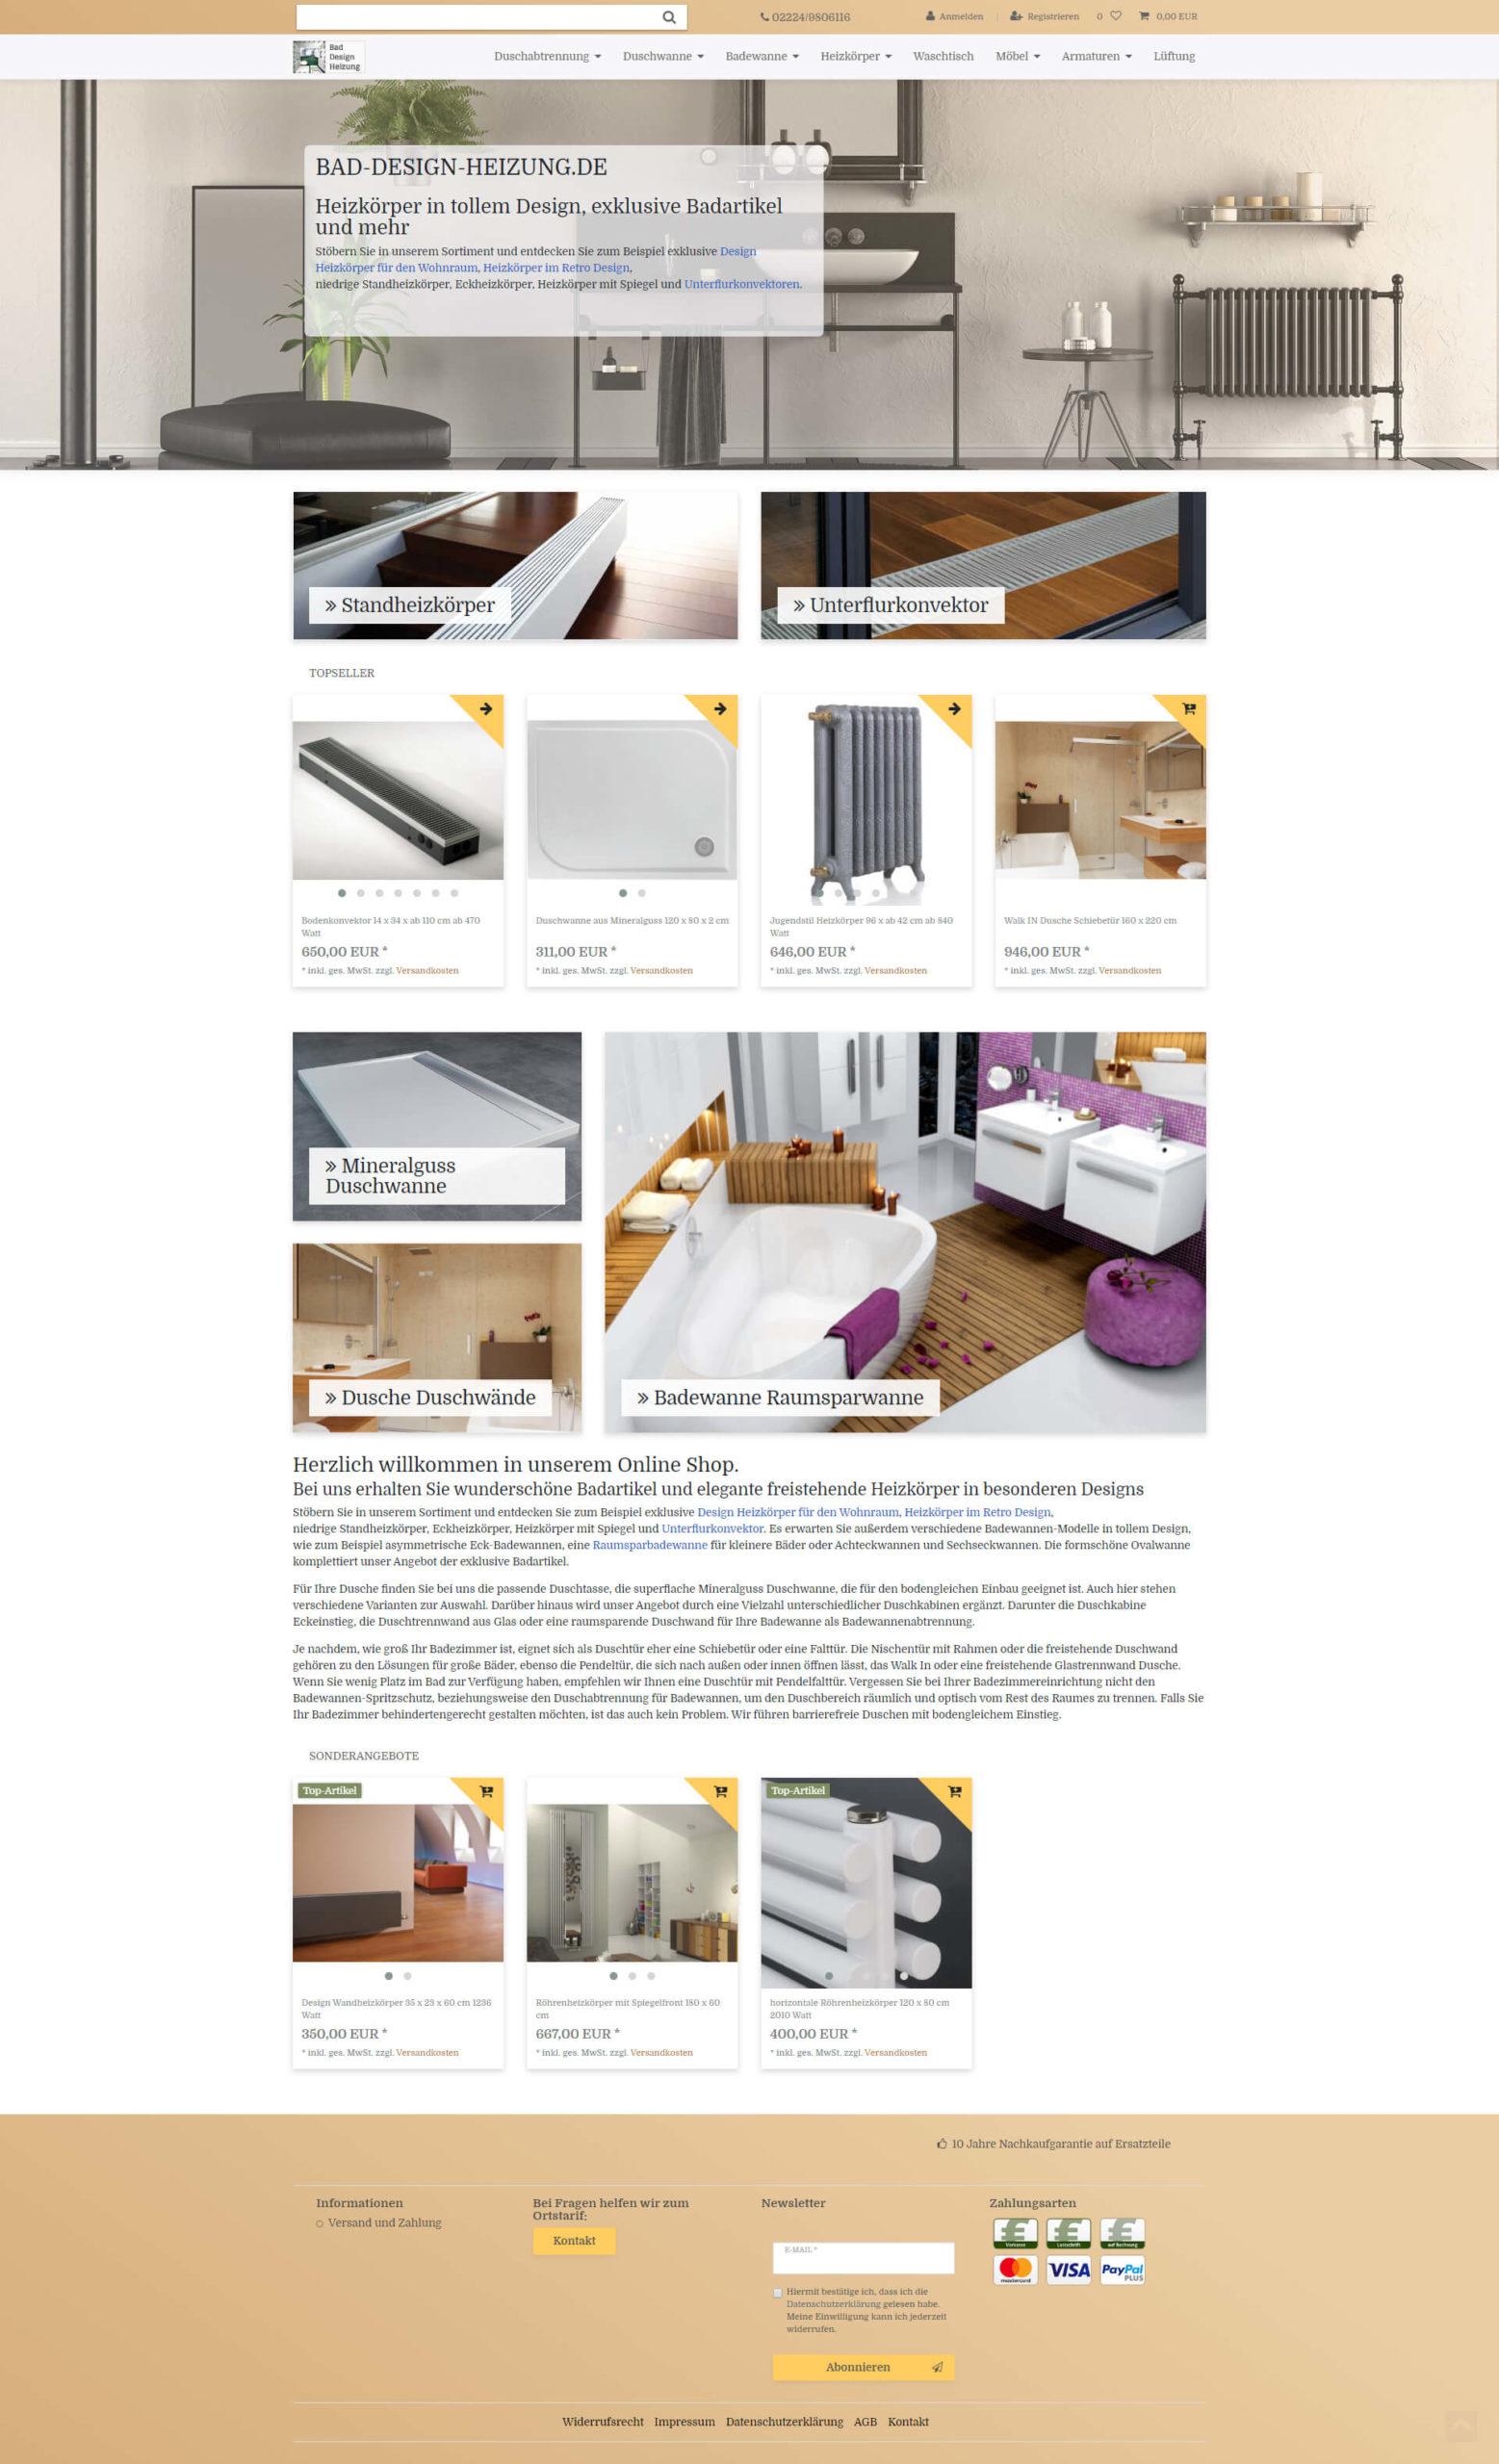 Web-Wikinger-ProjektbildBad-Design-Heizung